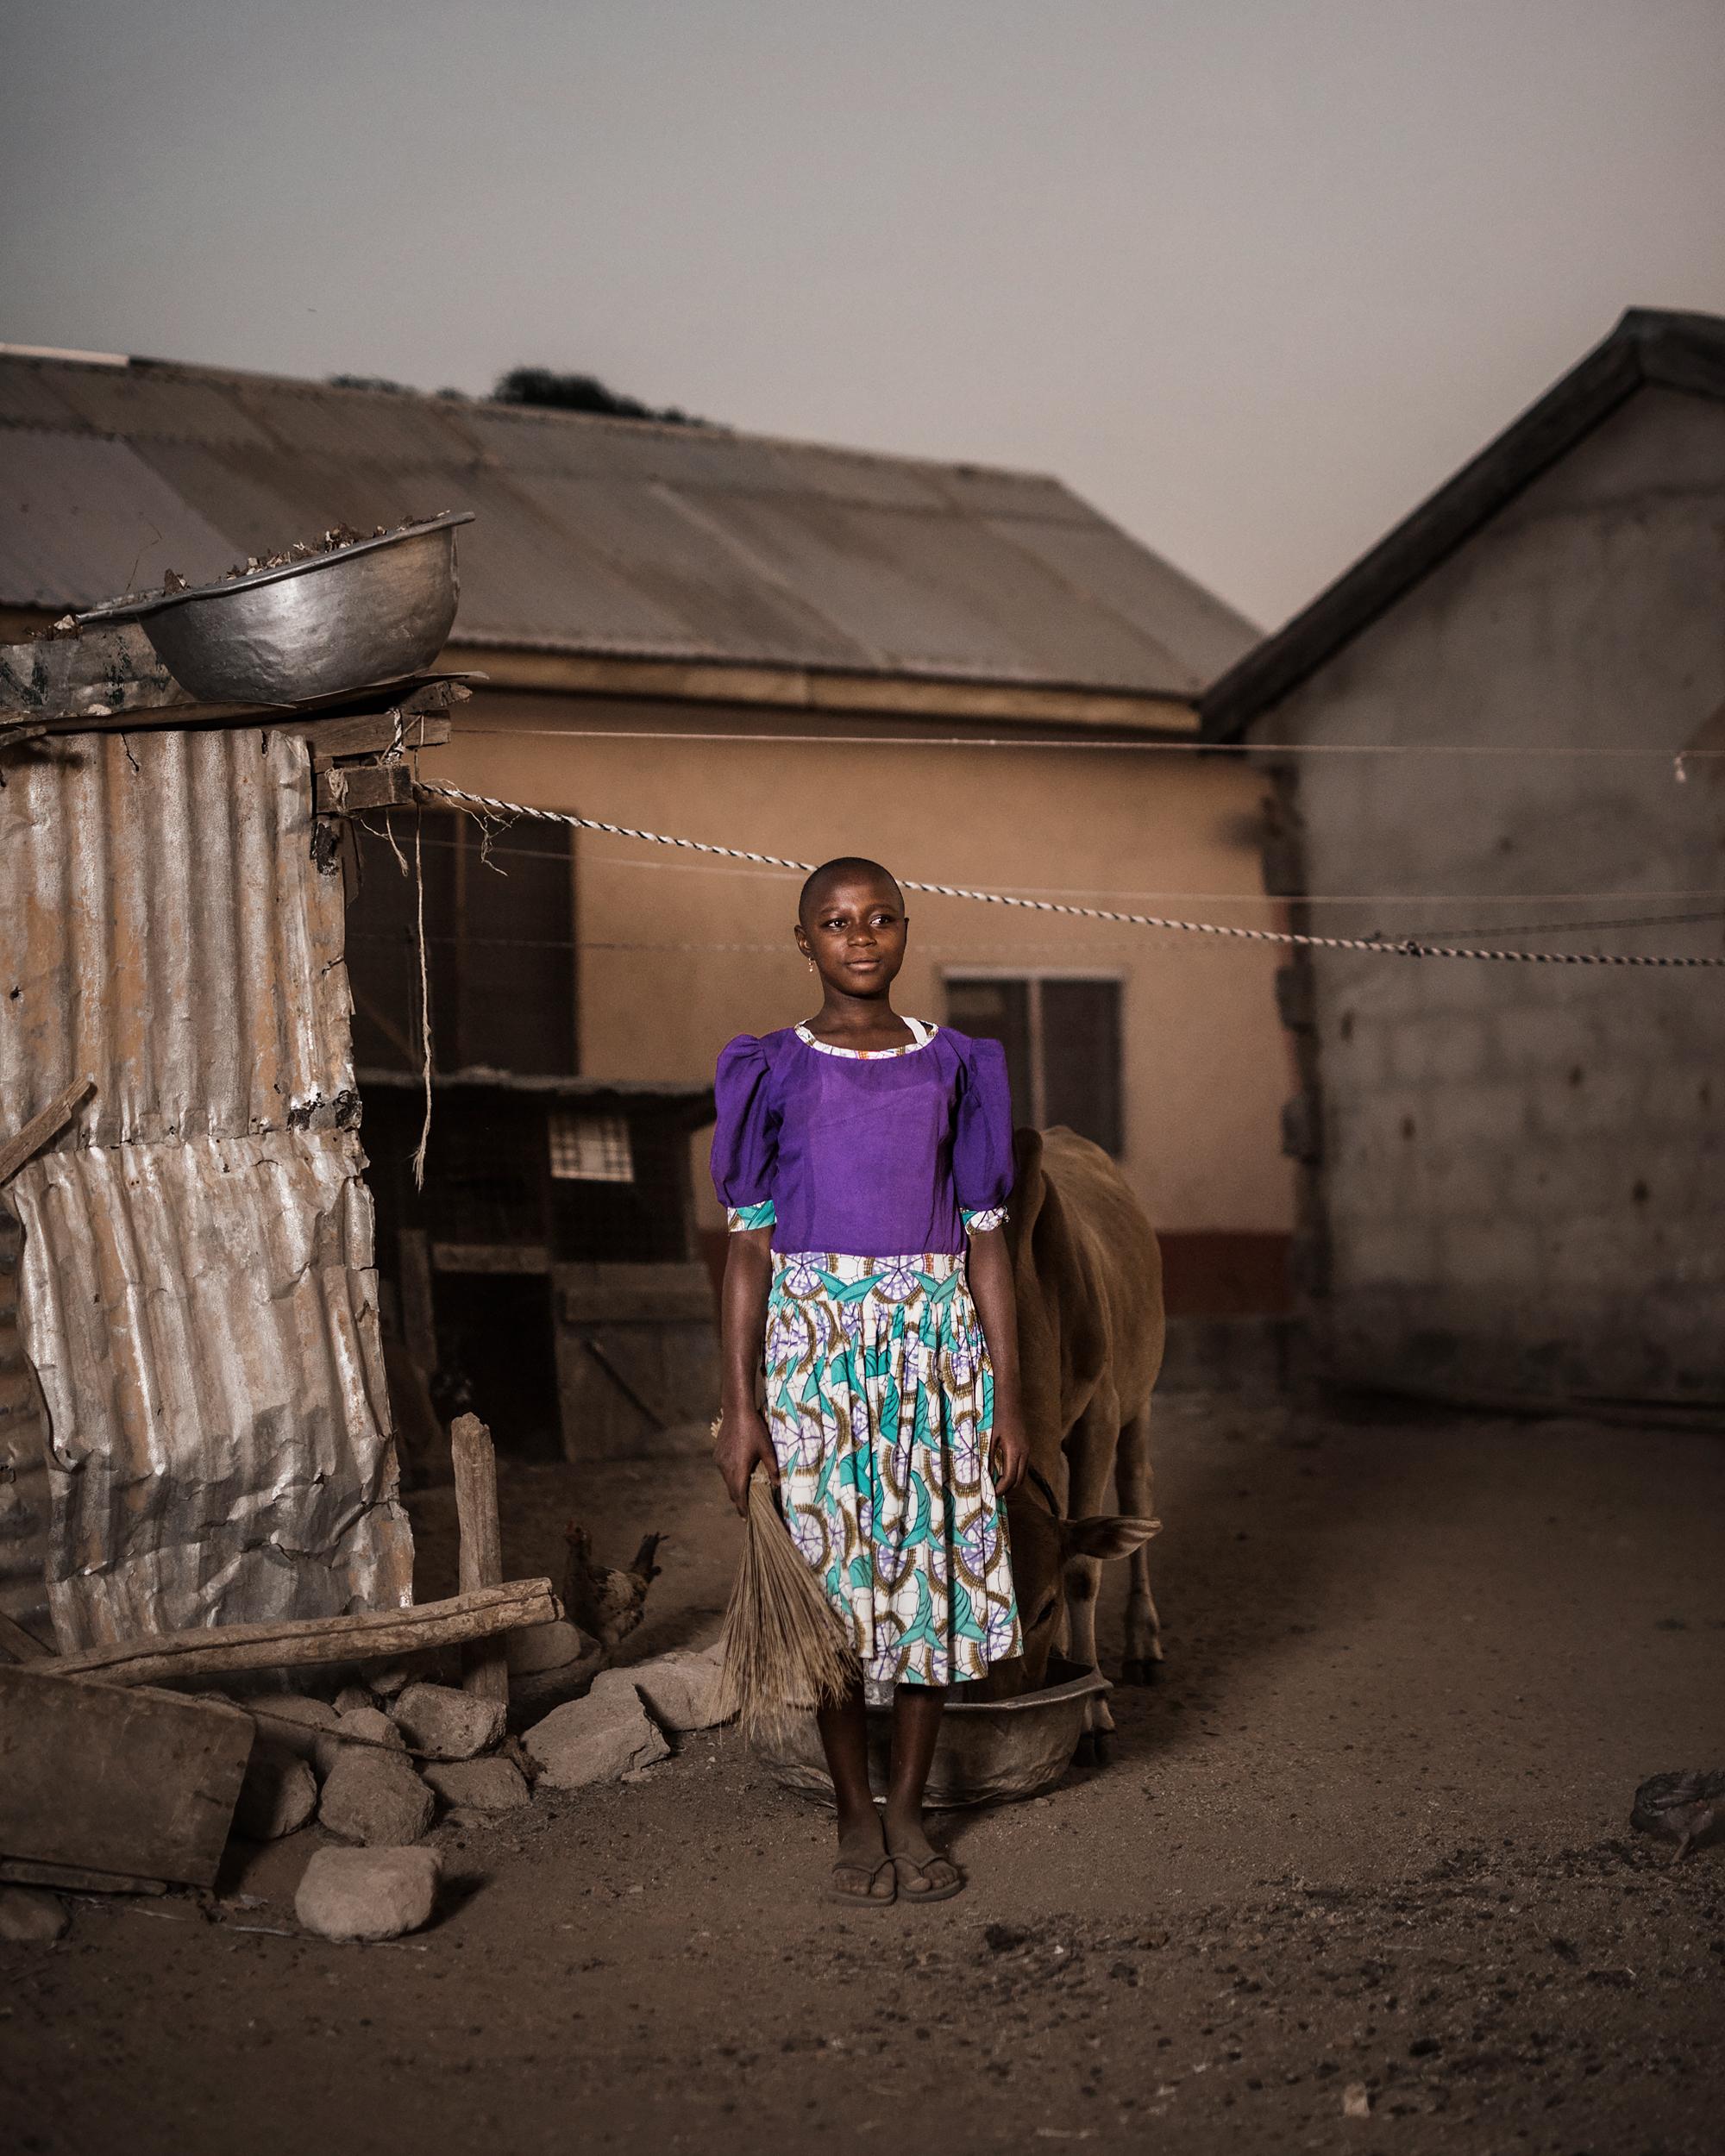 TaraShupe_HumanitarianPhotographer_Woman_Photographer_National_Geographic_Ghana_Women_039.jpg